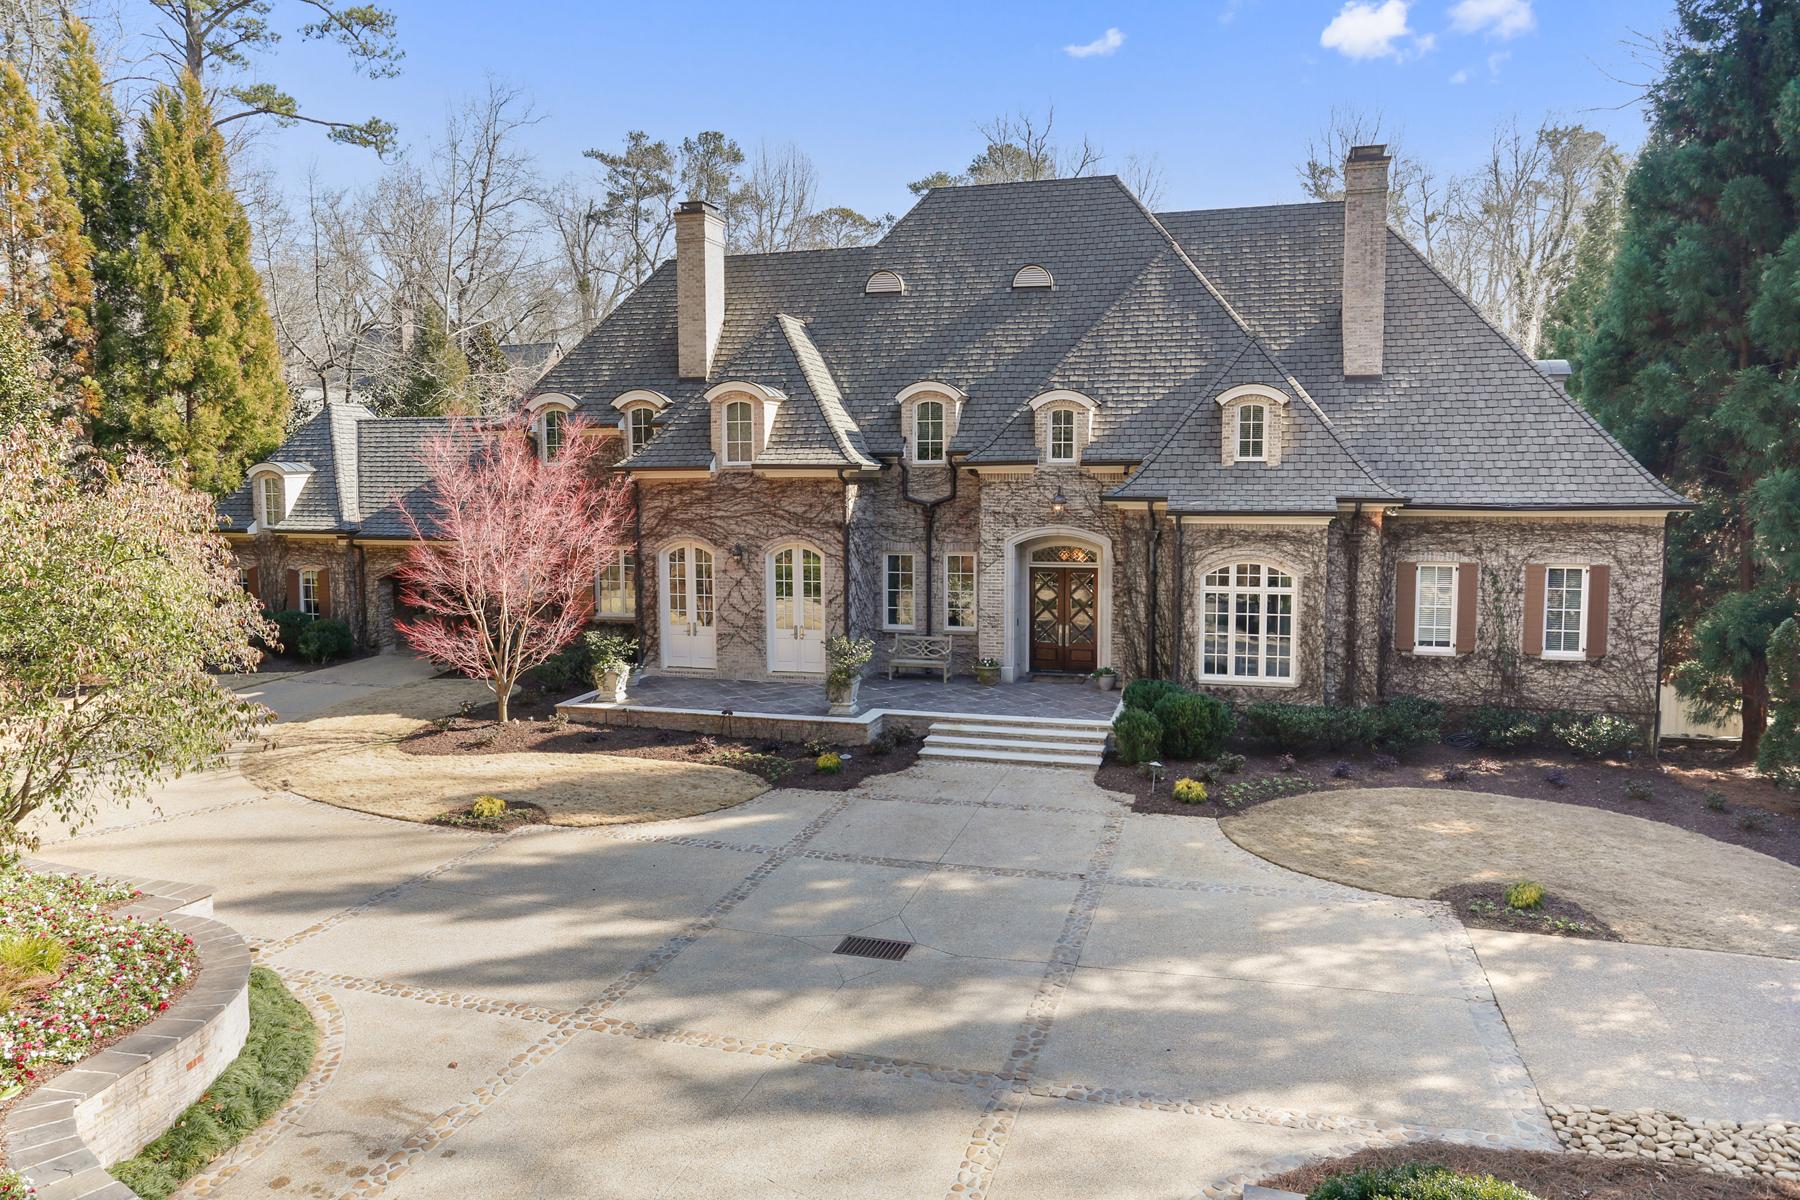 Single Family Home for Sale at Buckhead Palace 714 W Conway Drive NW Buckhead, Atlanta, Georgia, 30327 United States